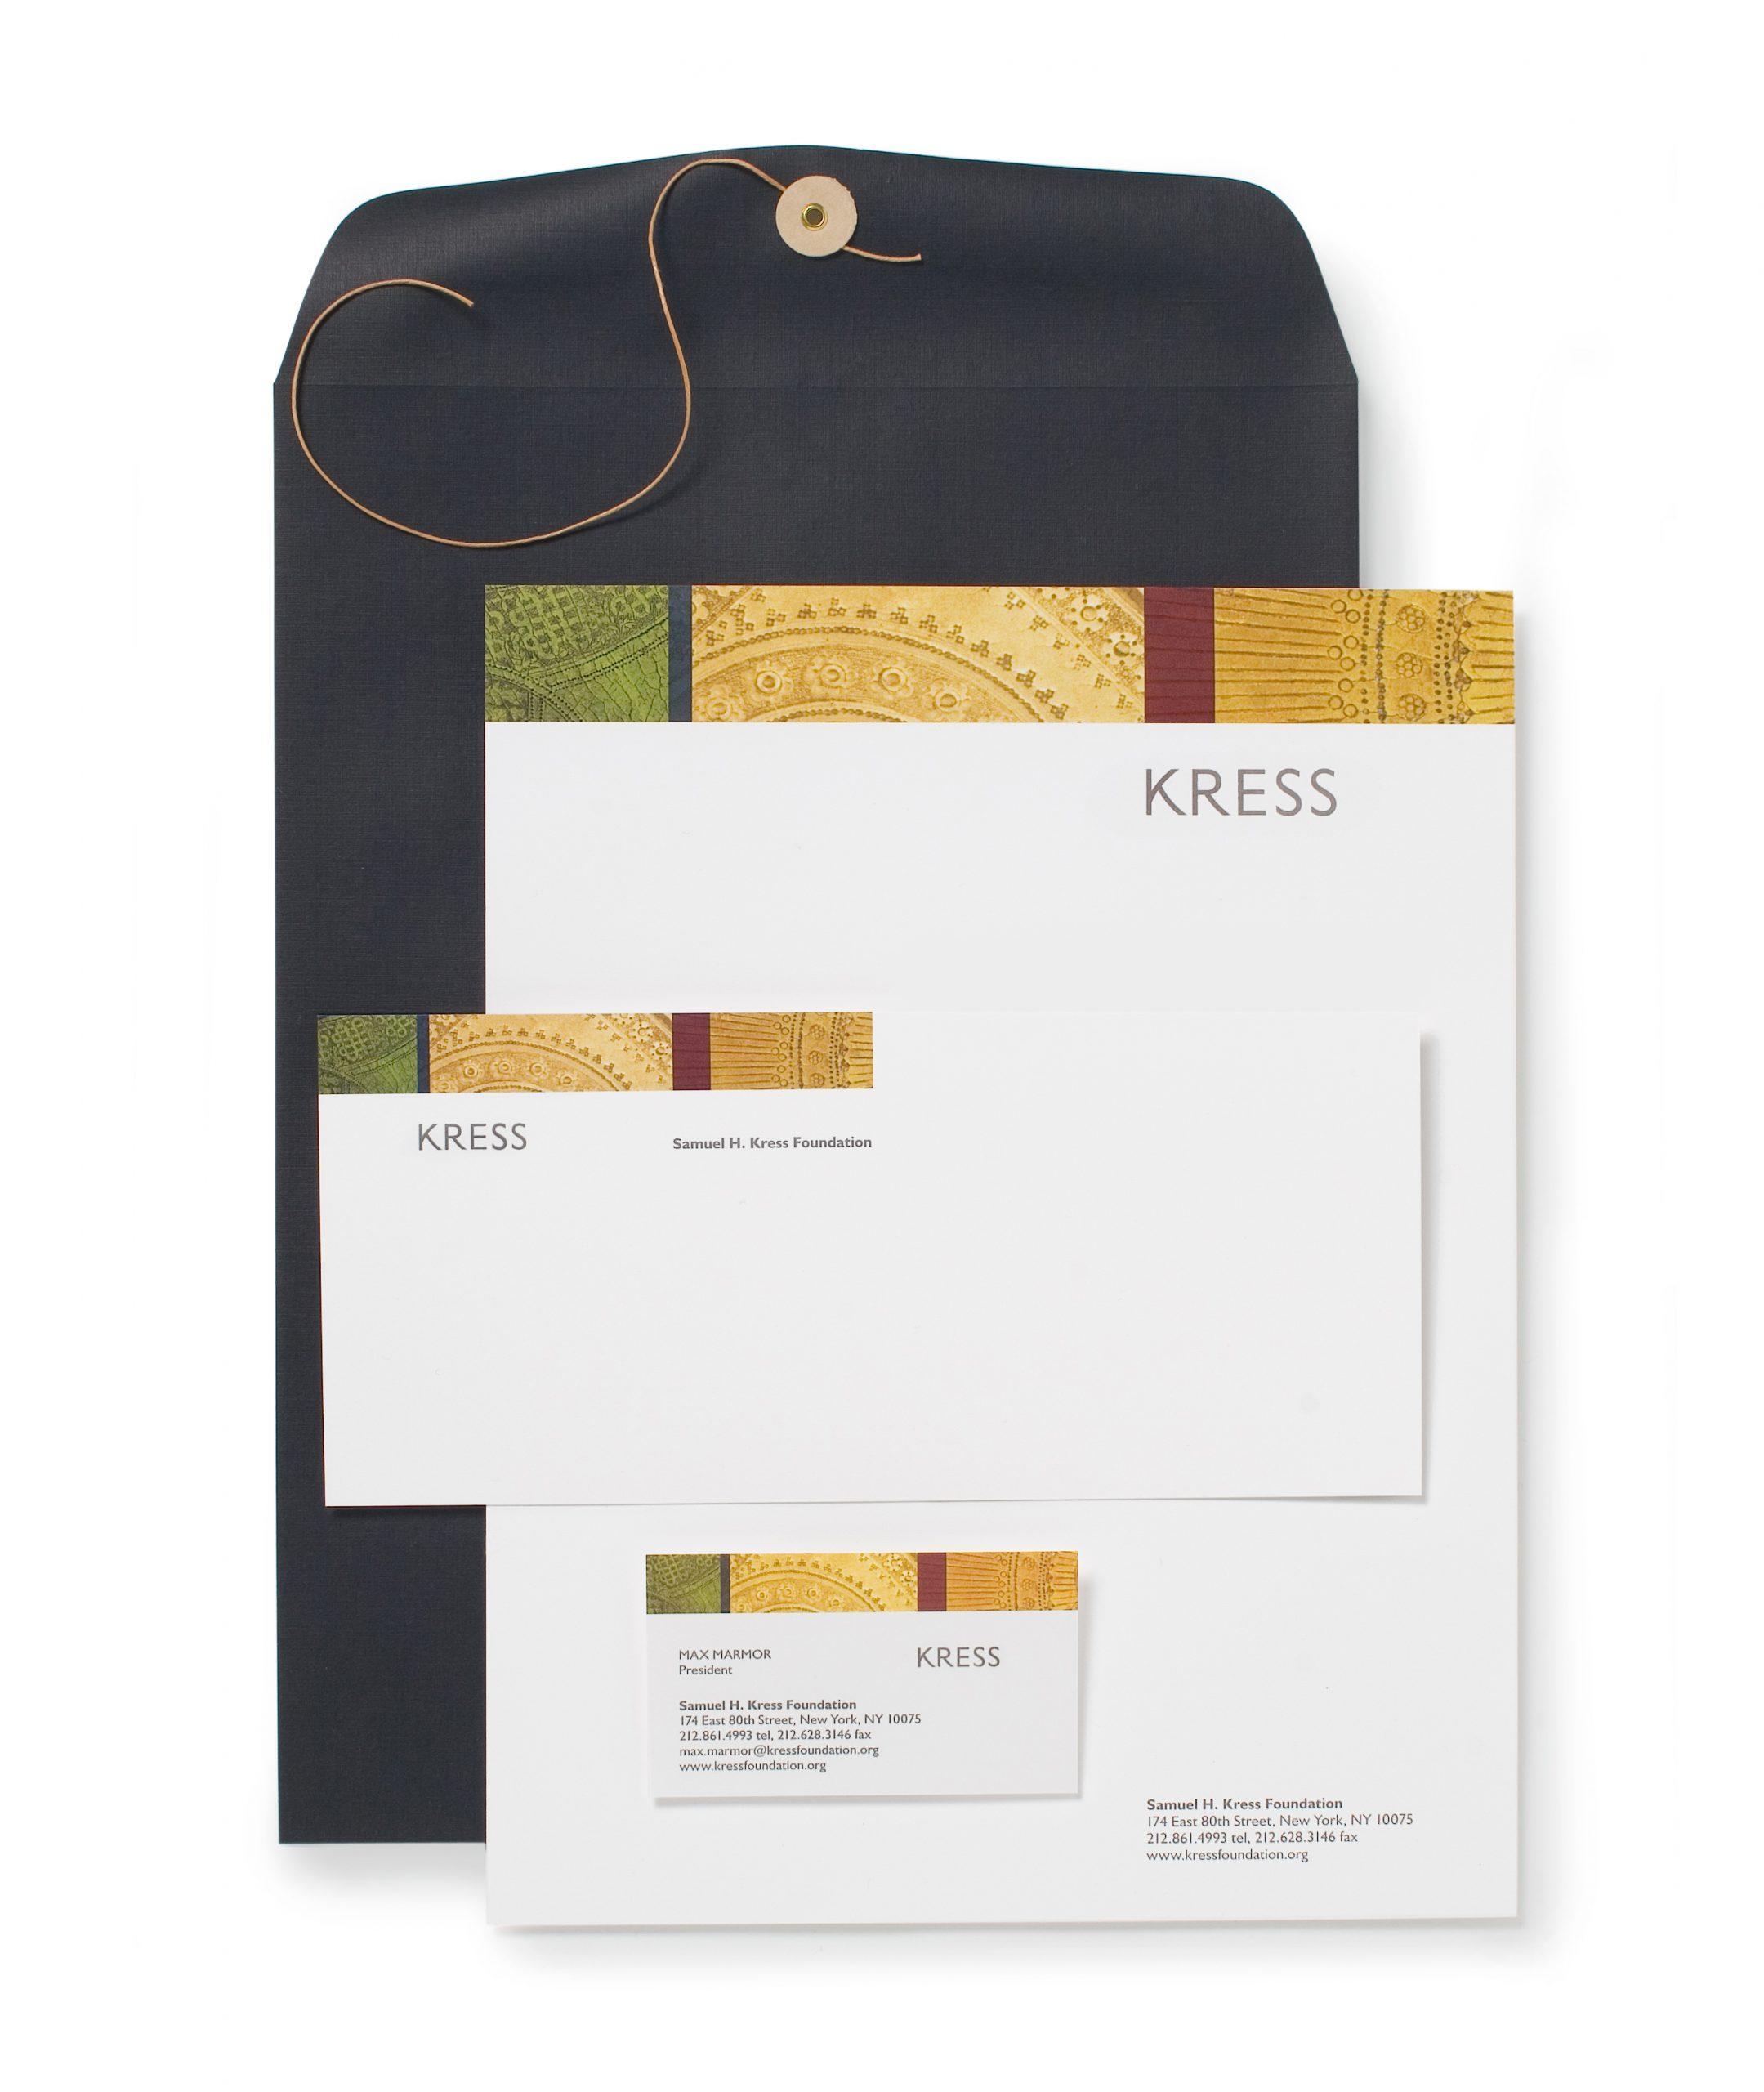 Project image 2 for Identity, Samuel H. Kress Foundation